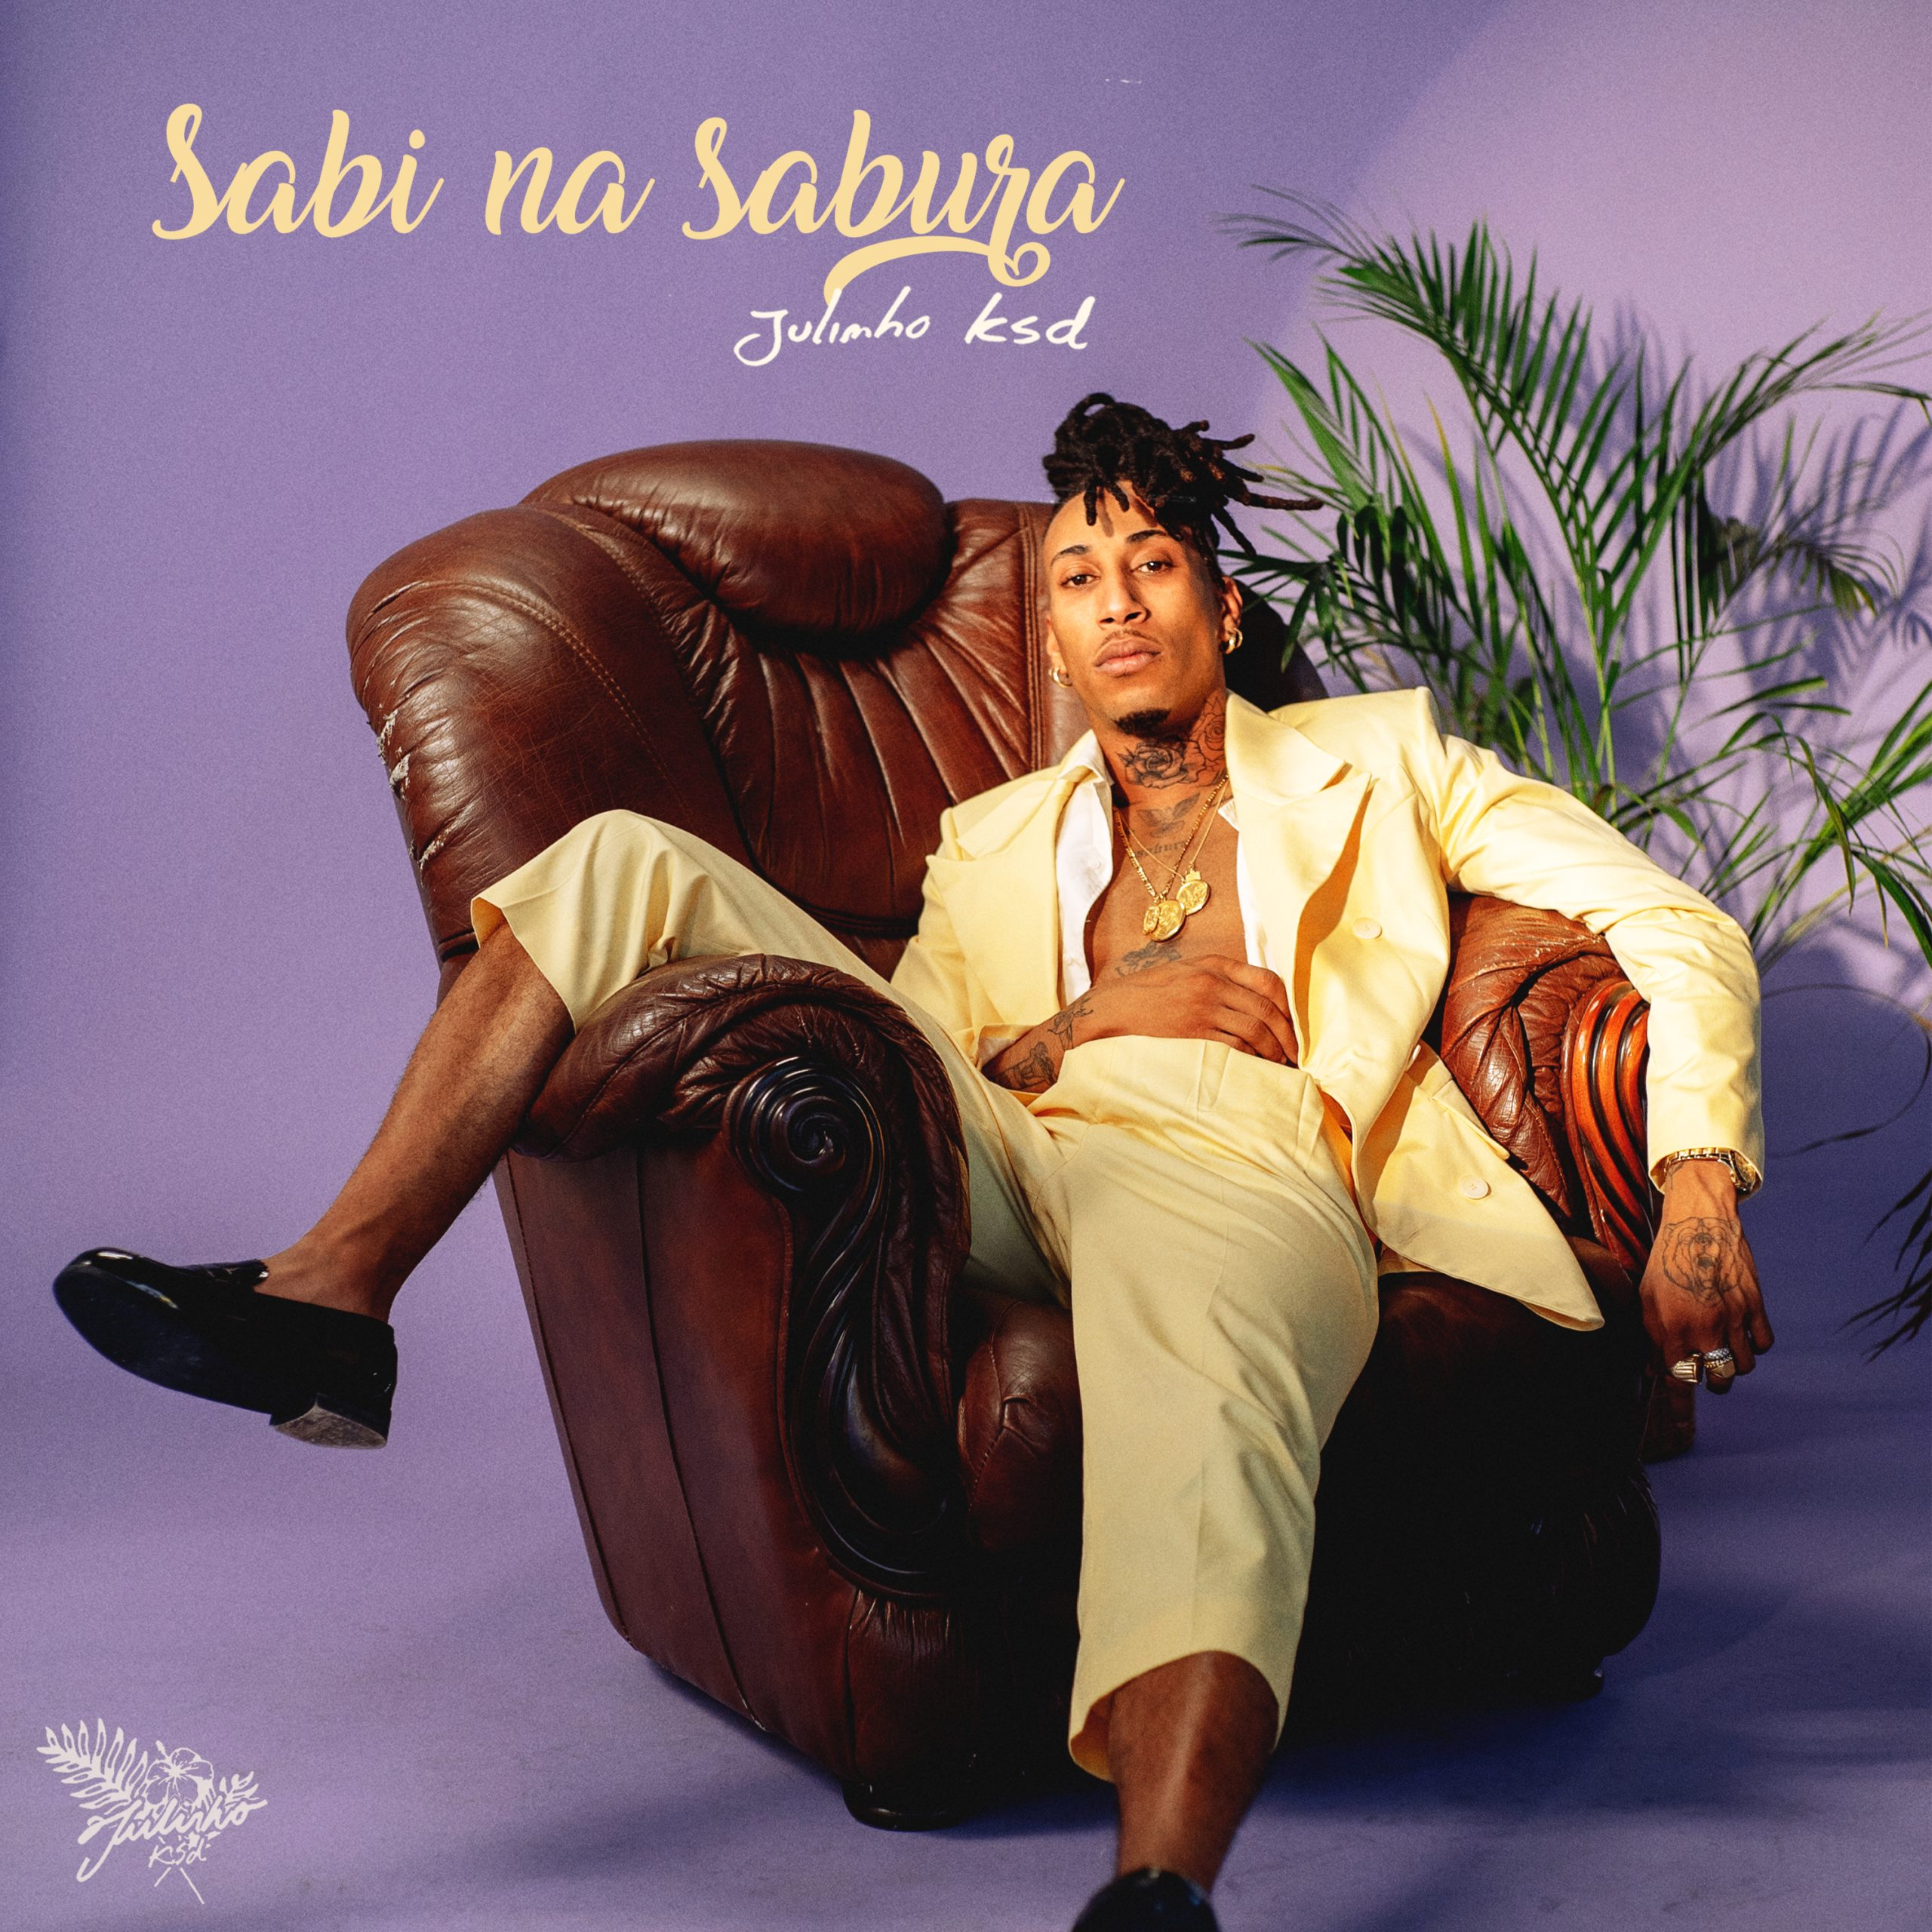 Julinho KSD_Capa Album Sabi na Sabura (1)